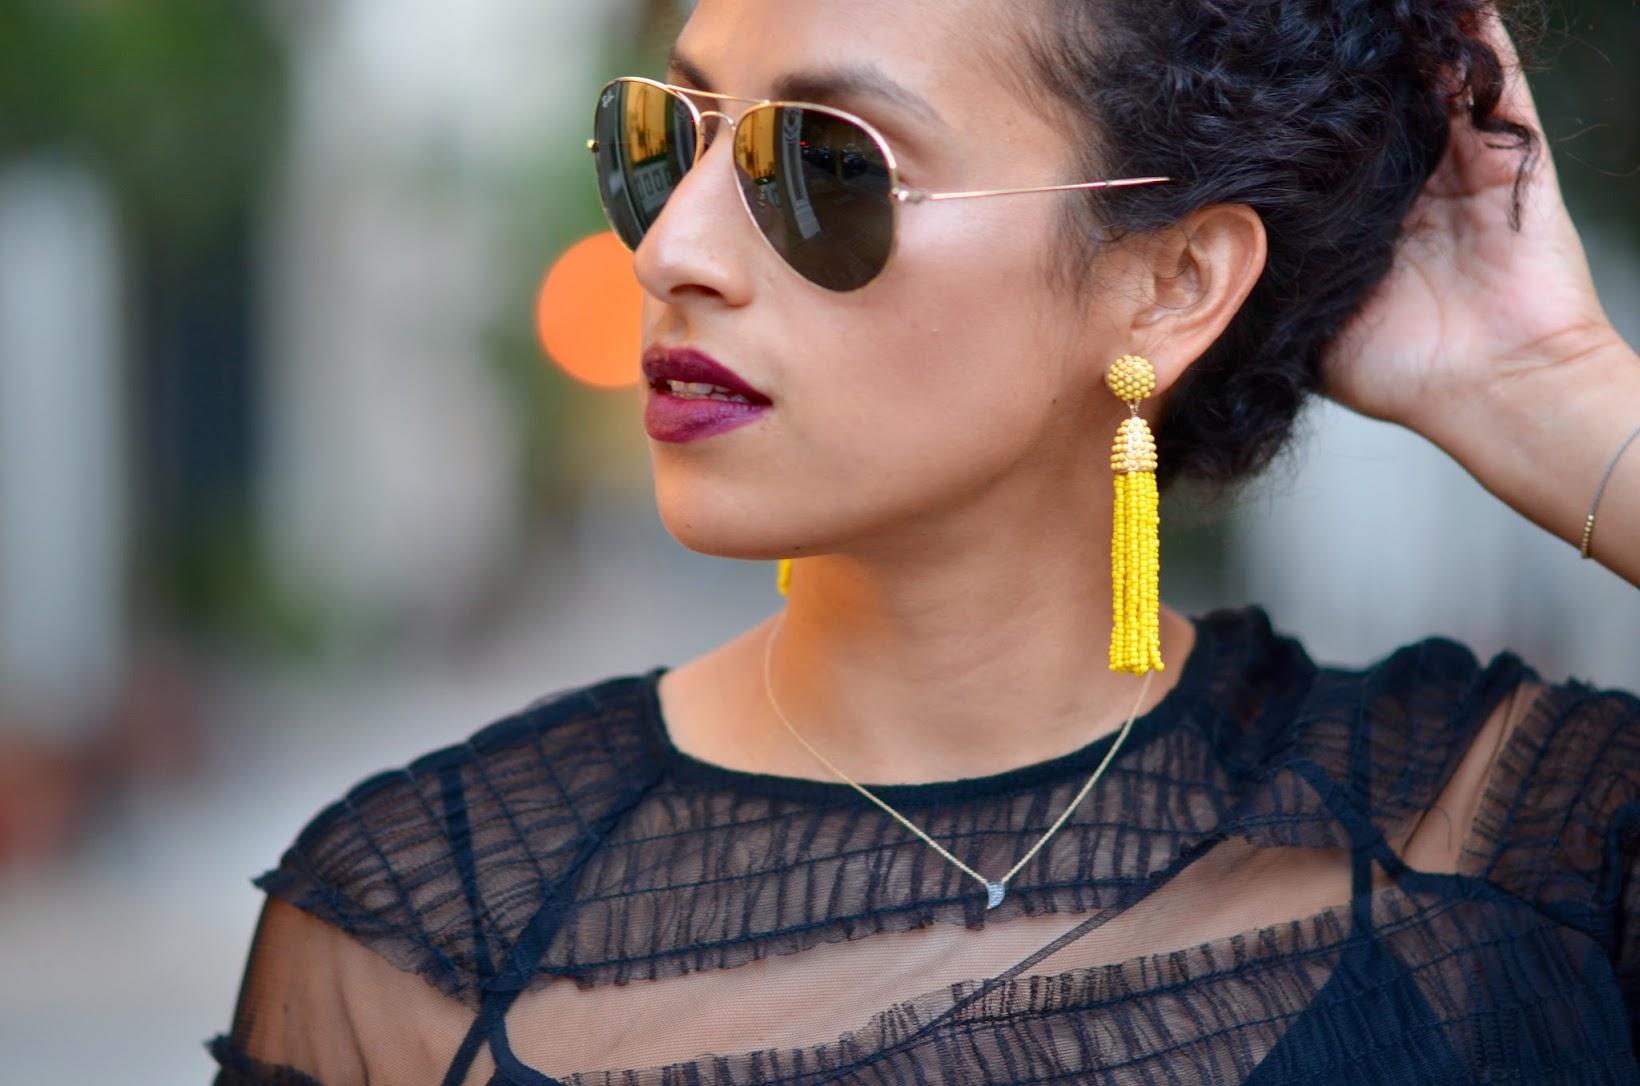 Zara tulle top, all black, chic hallowee syle, Coach stud pumps, BabuleBar Piñata earrings, tulle zara top, romantic ruffle top, Sf street style